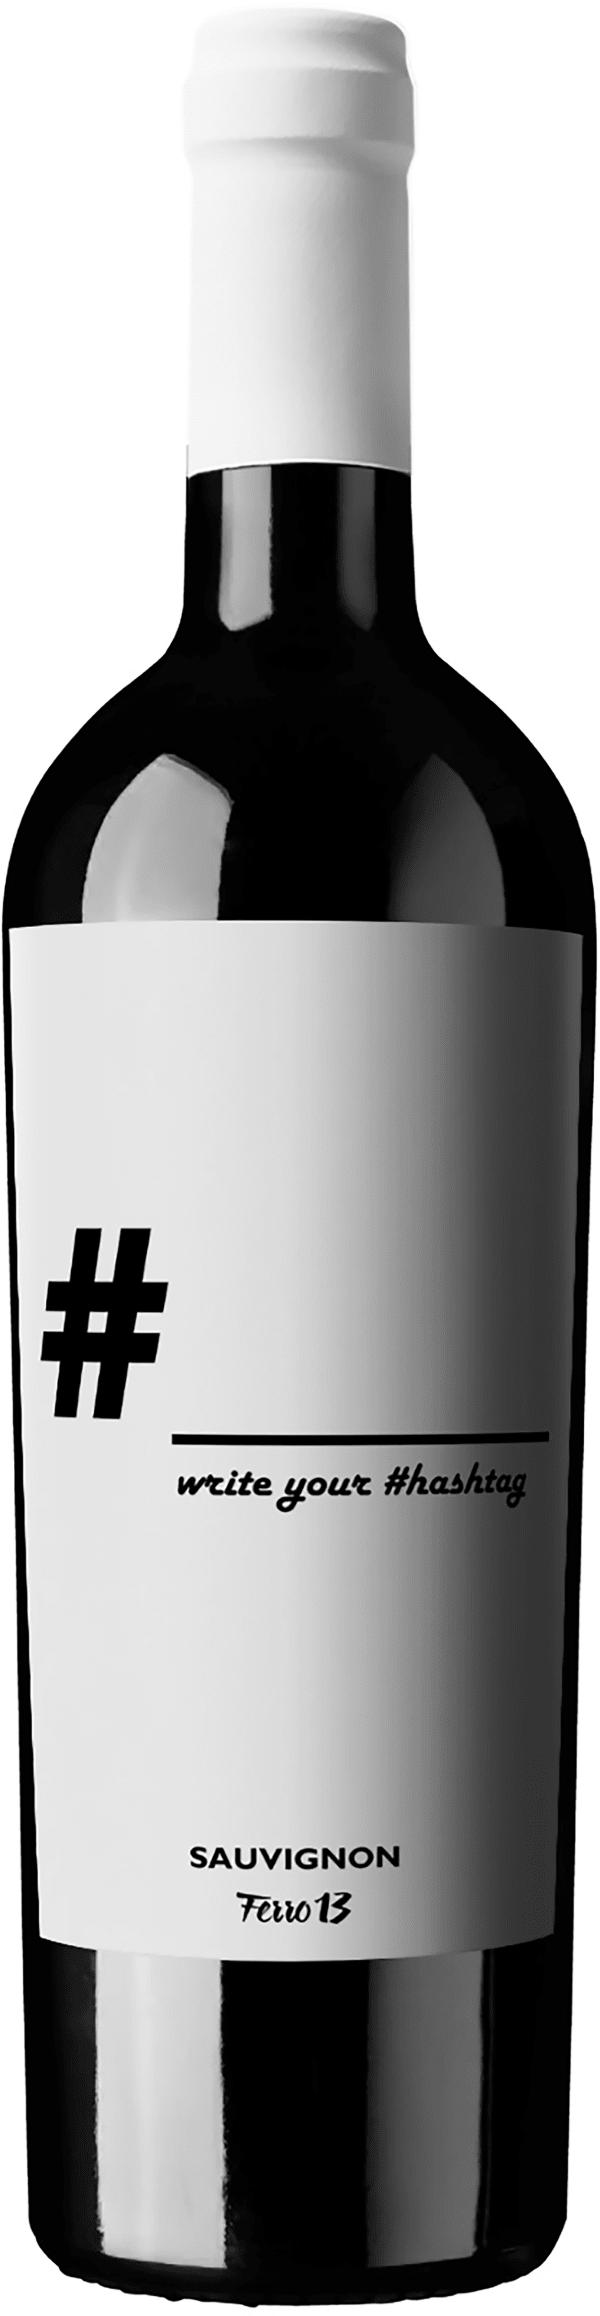 "Ferro 13, ""Hashtag"" – Sauvignon Blanc"